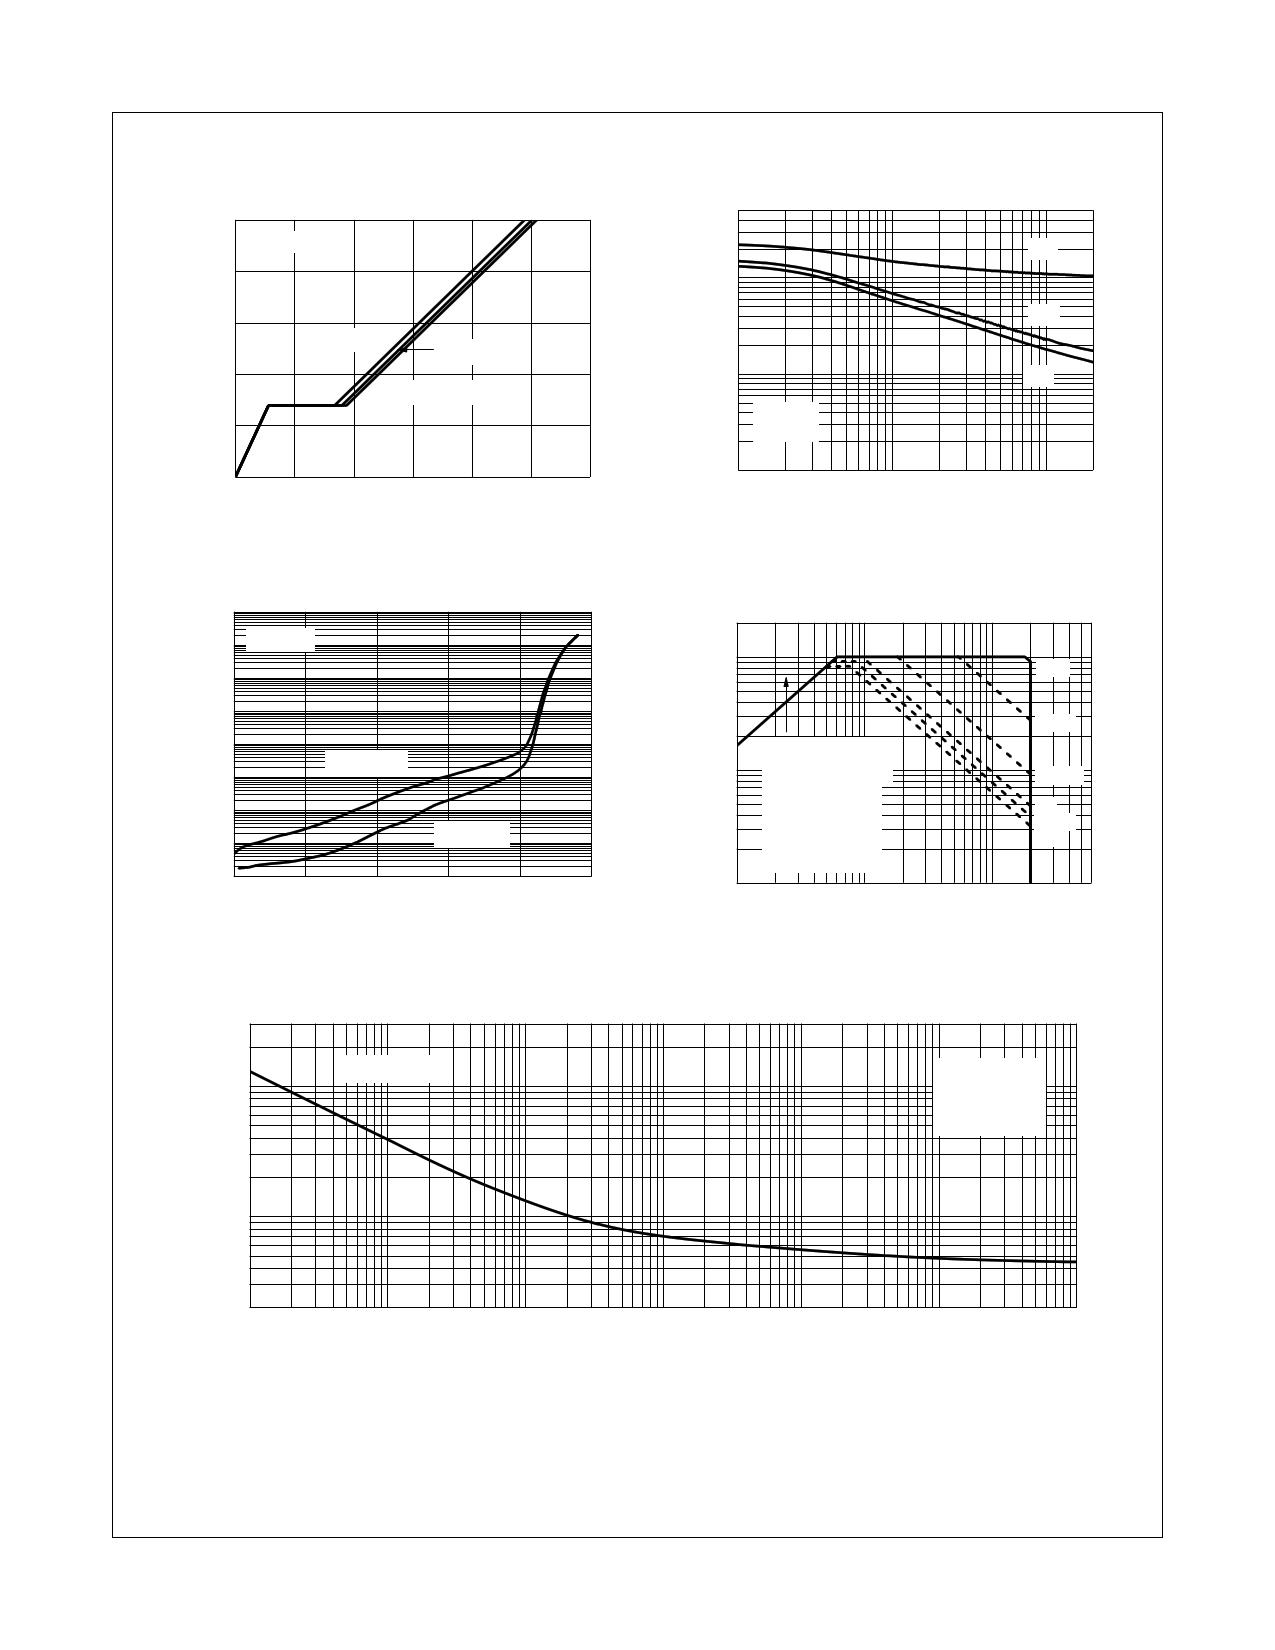 FDY102PZ pdf, 반도체, 판매, 대치품